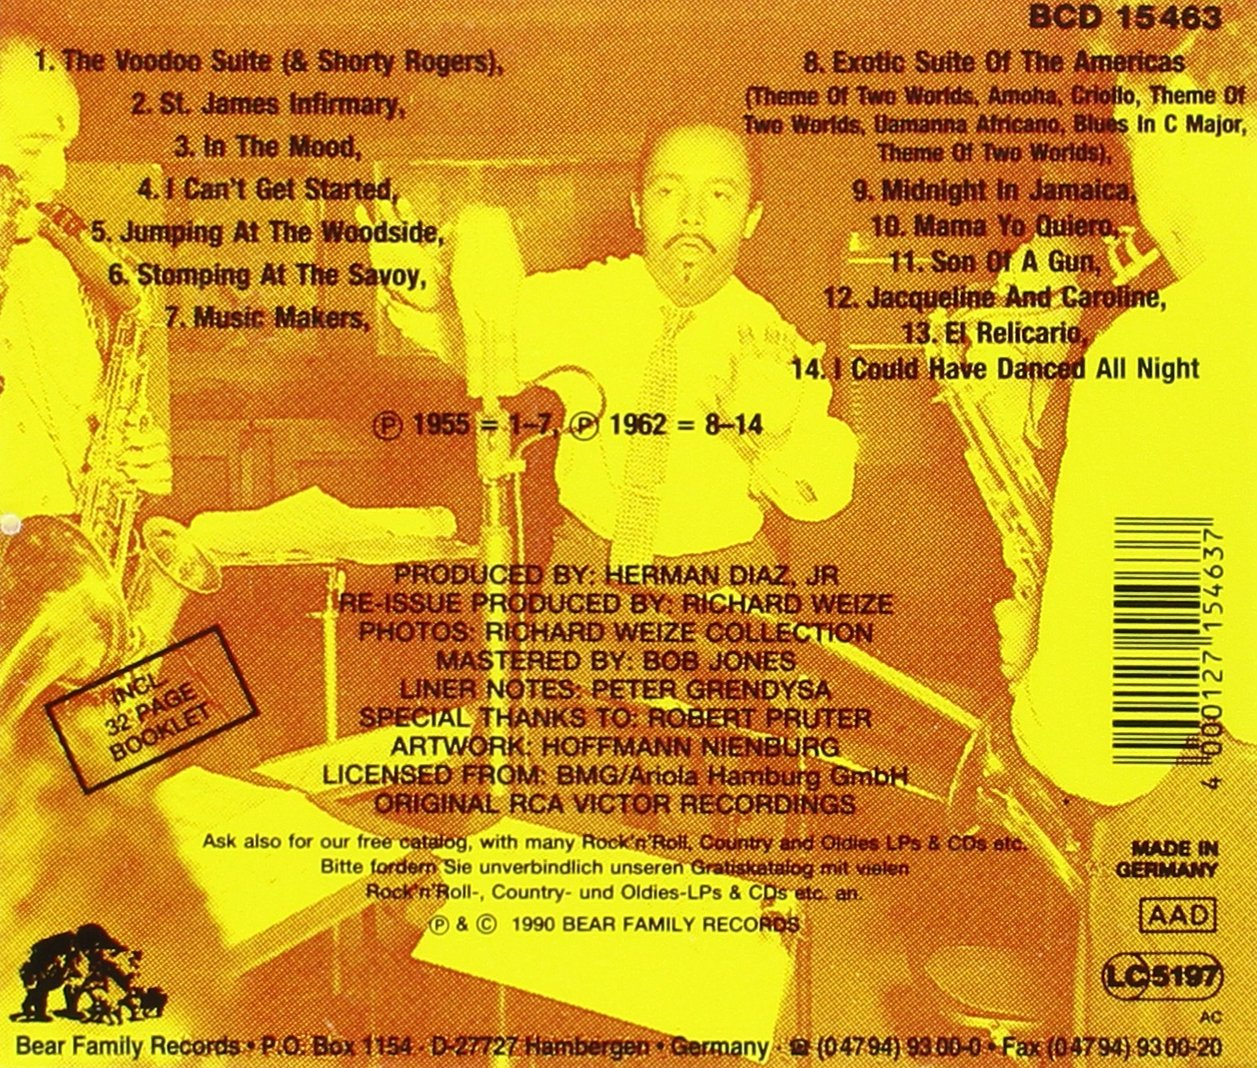 Voodoo Suite / Exotic Suite of the Americas